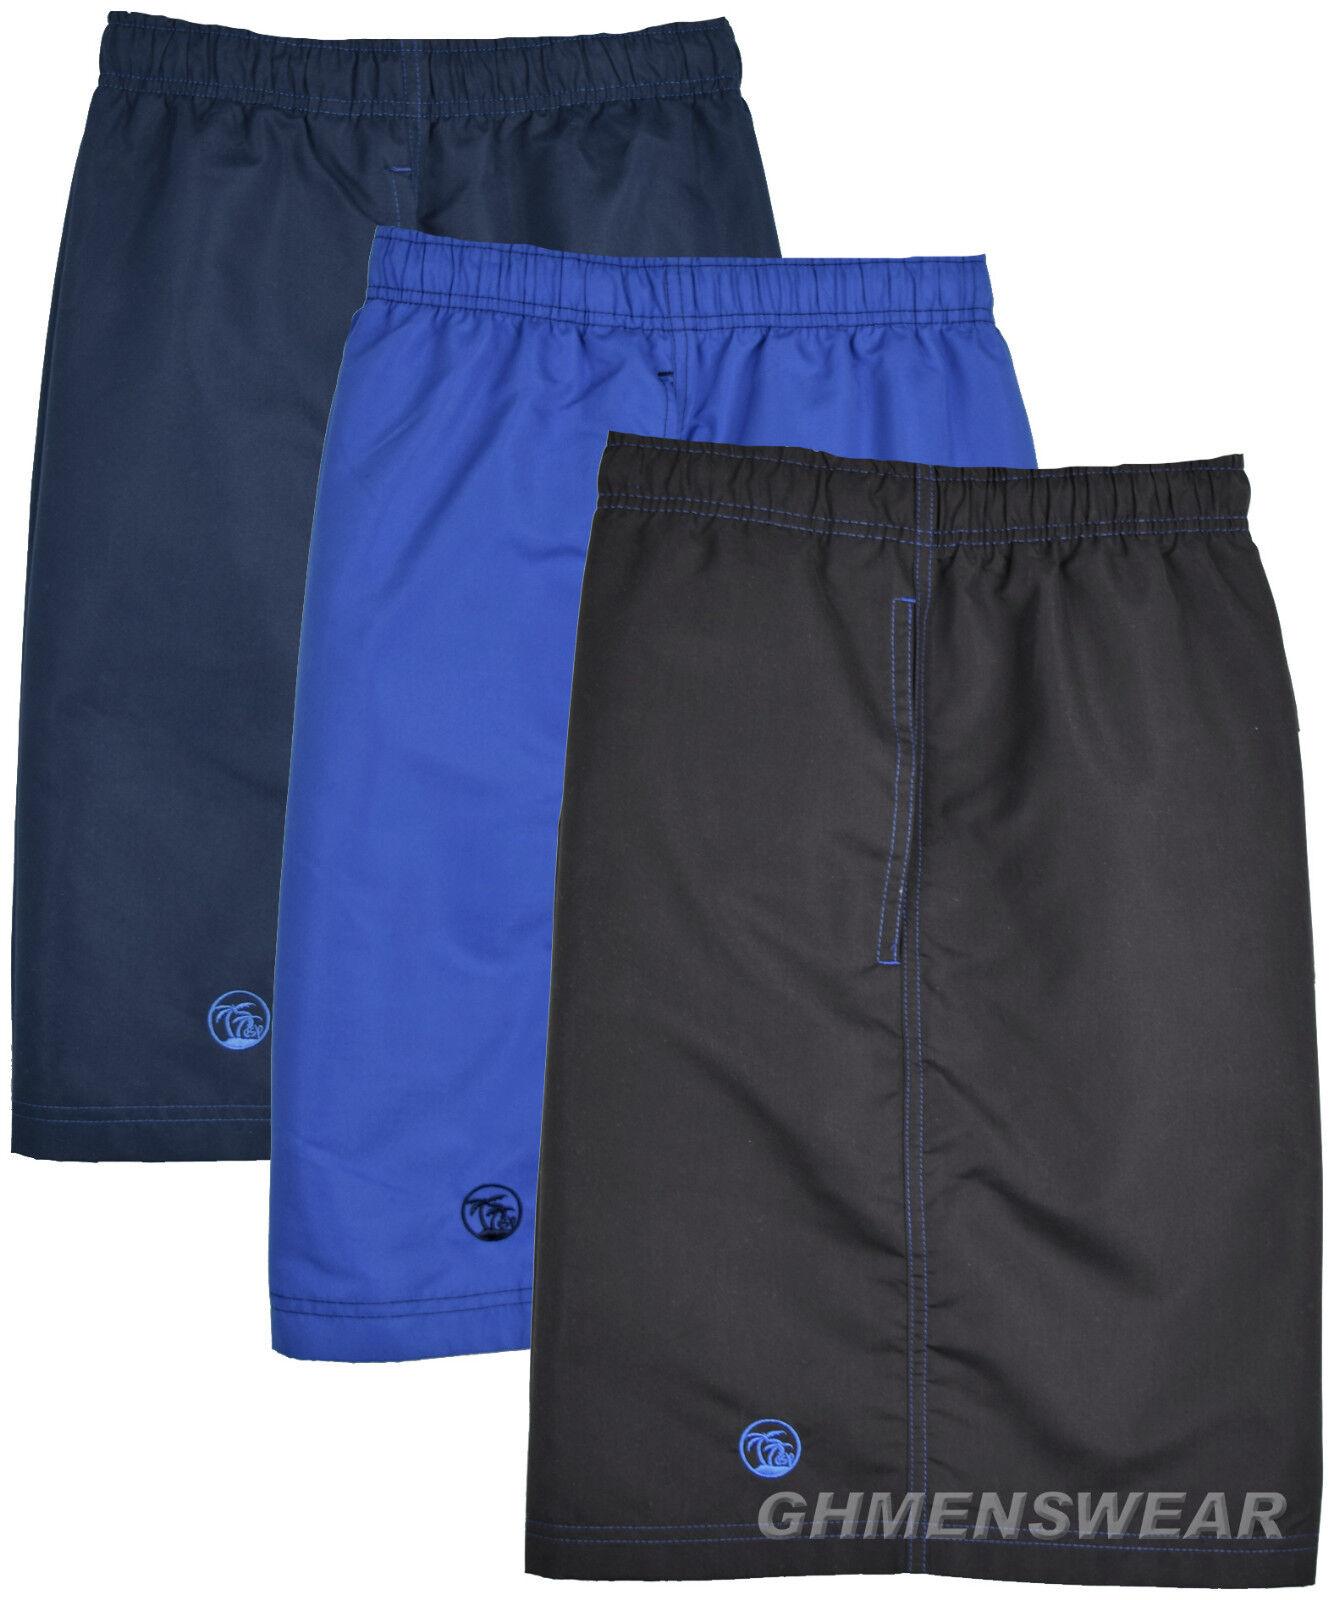 Big Mens KINGSIZE Cargo Swim Shorts Size XXL XXXL 2XL 3XL 4XL 5XL 6XL 7XL 8XL